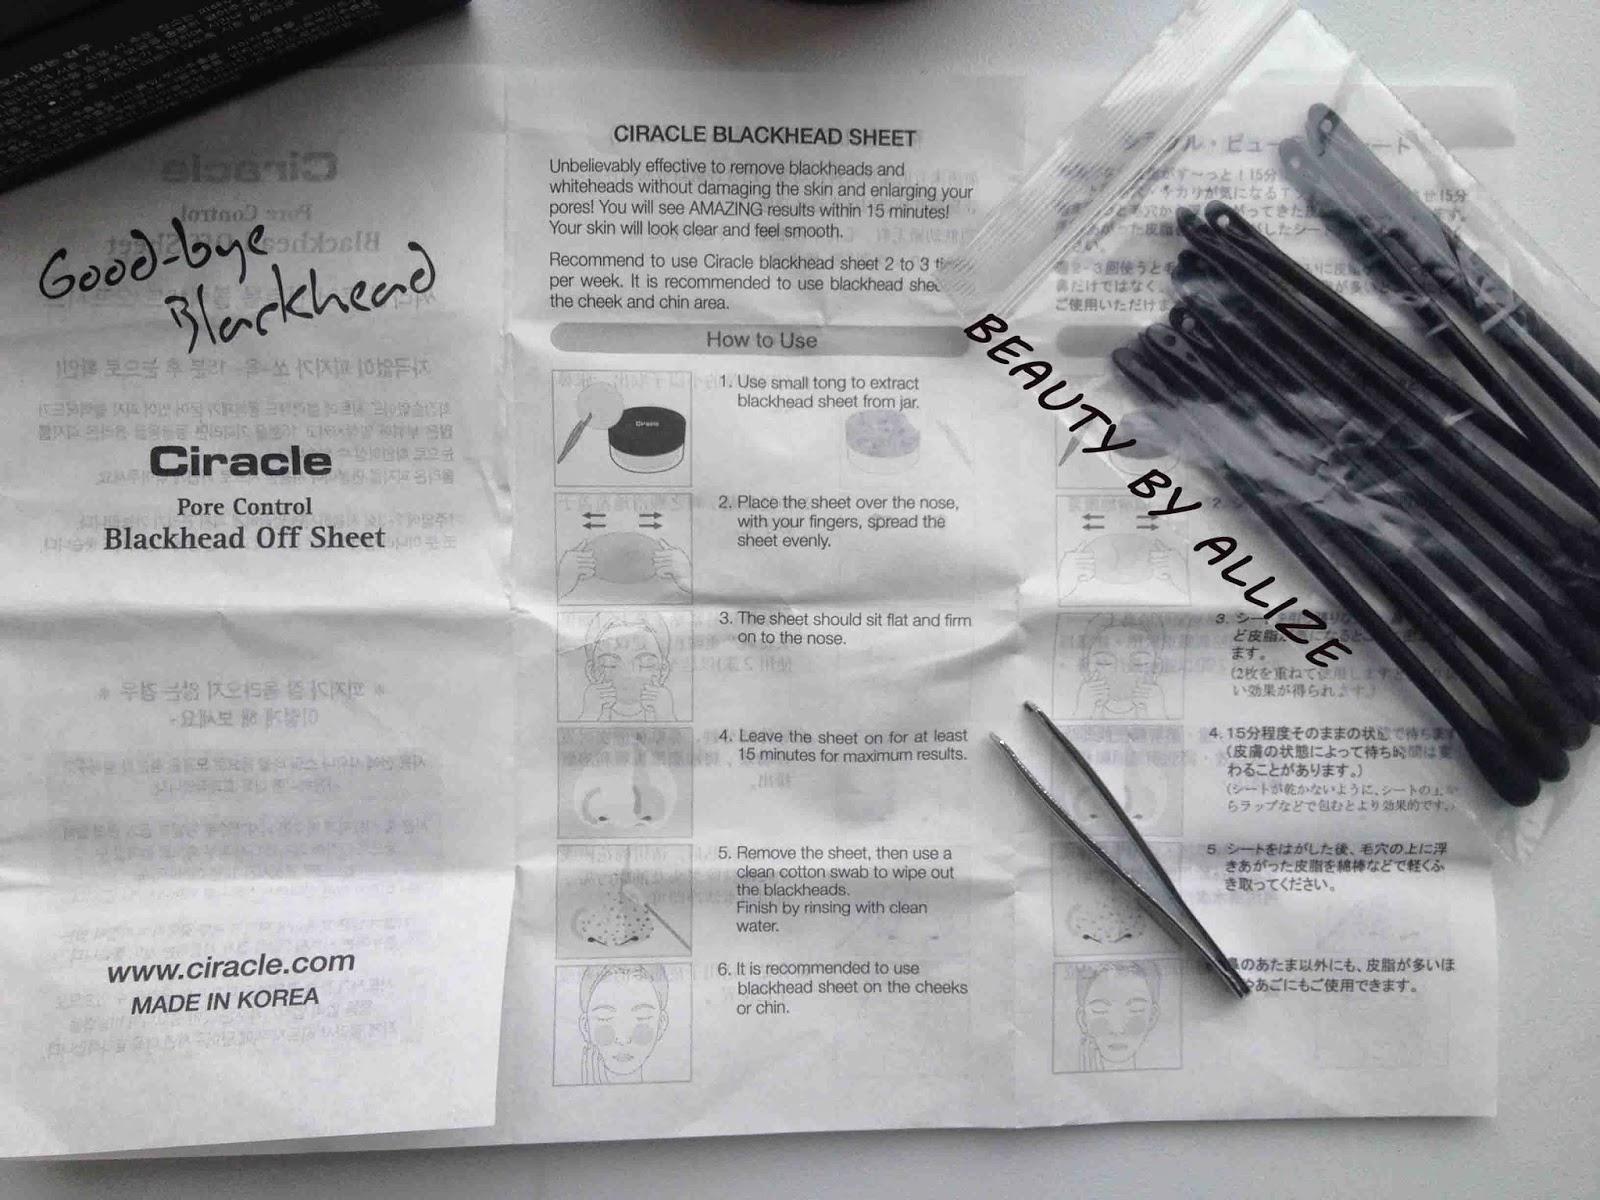 салфетки от черных точек Ciracle Pore Control Blackhead Off Sheet